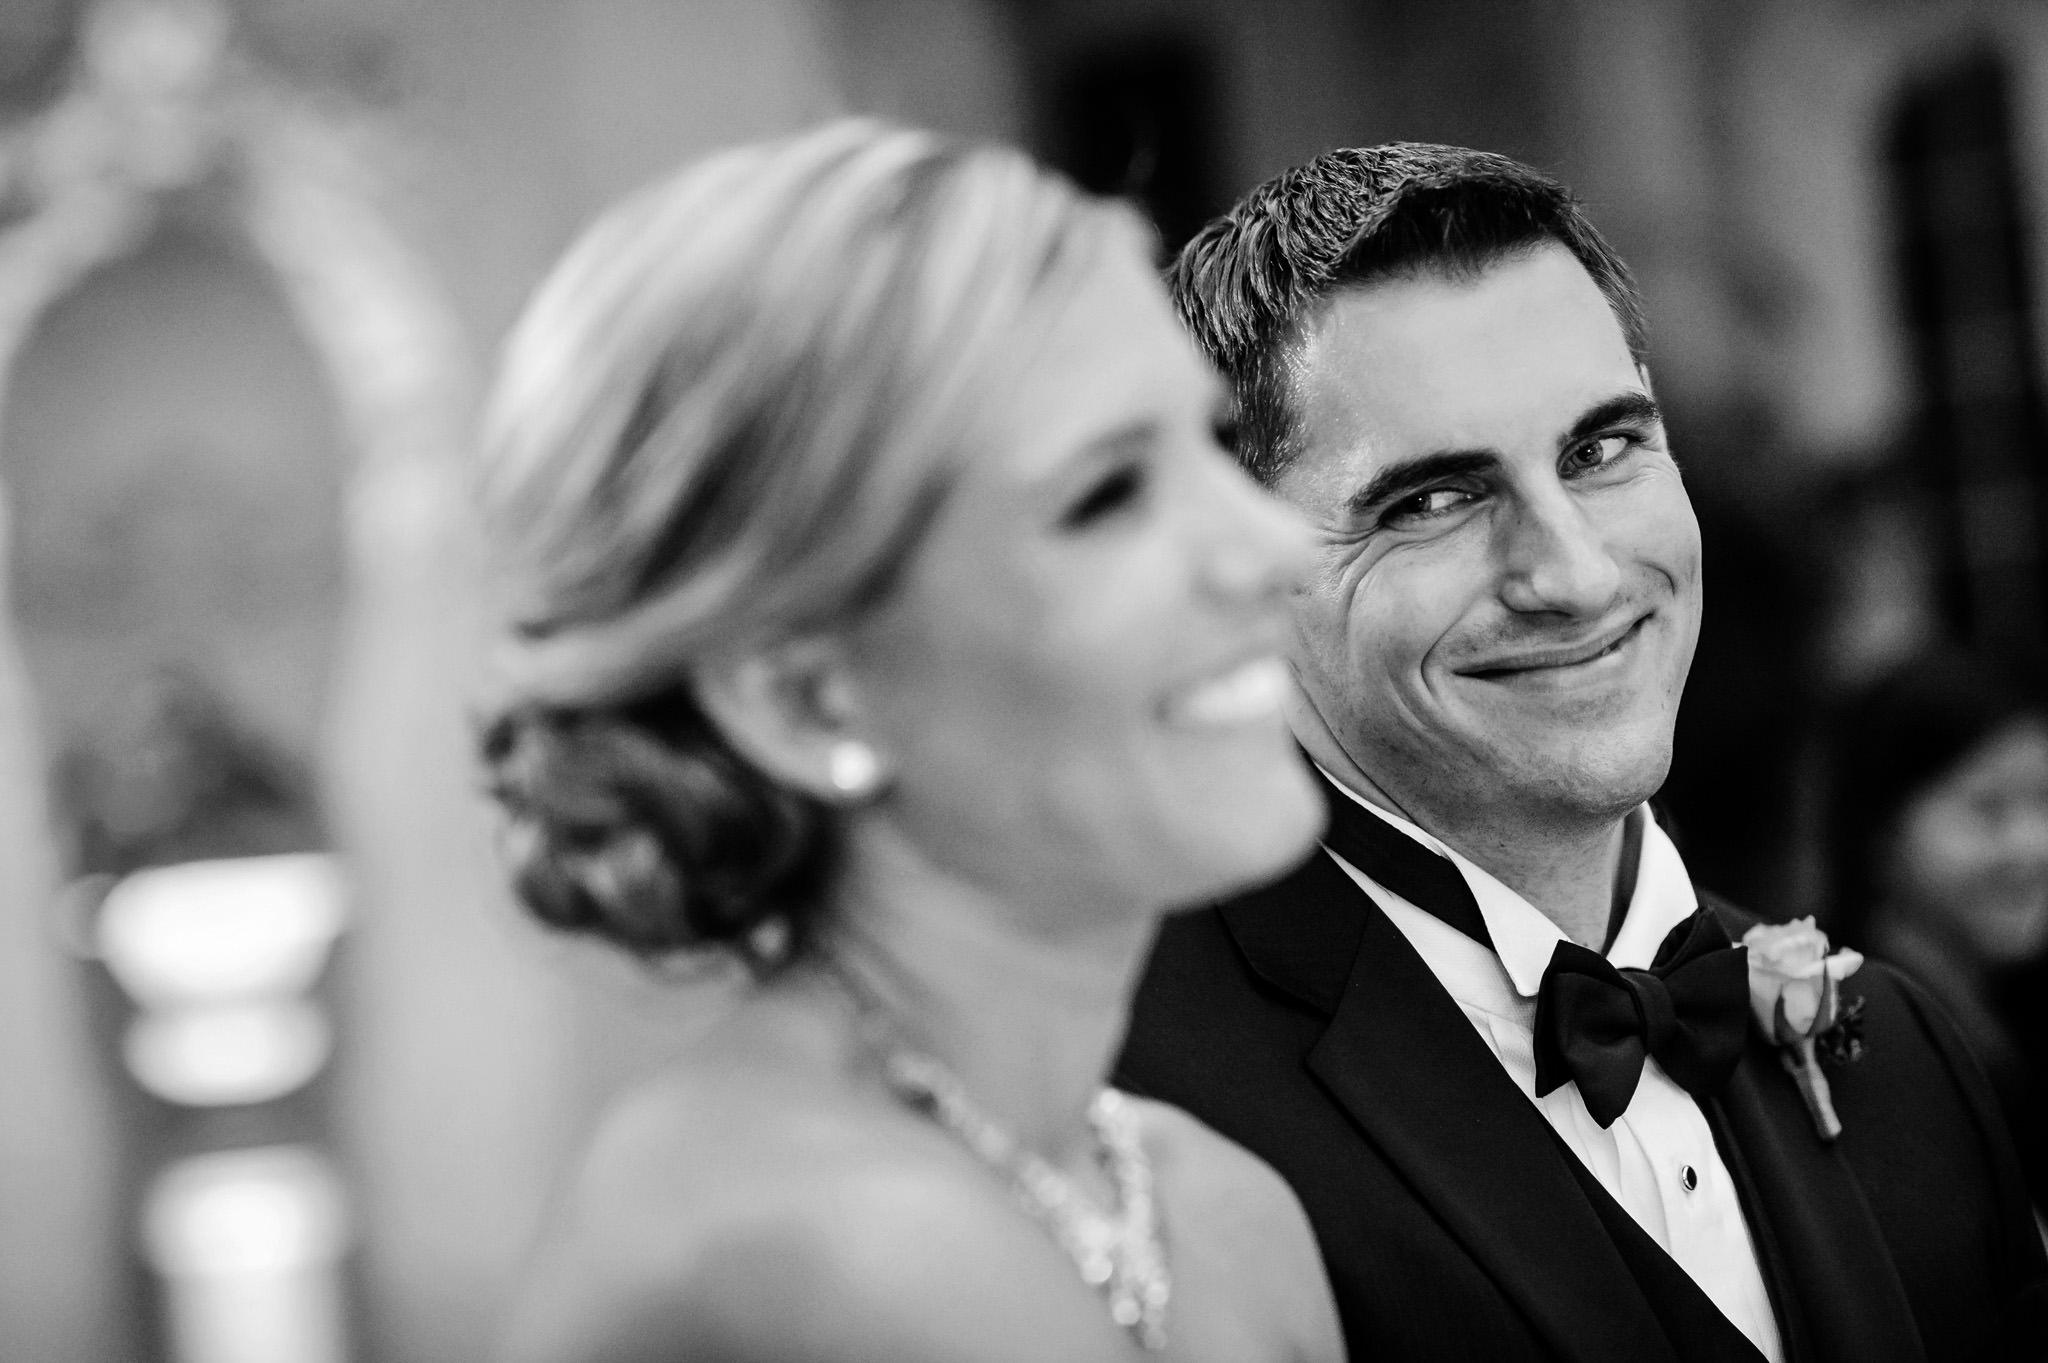 20-20140913-ShannonDan-Spradling-wed